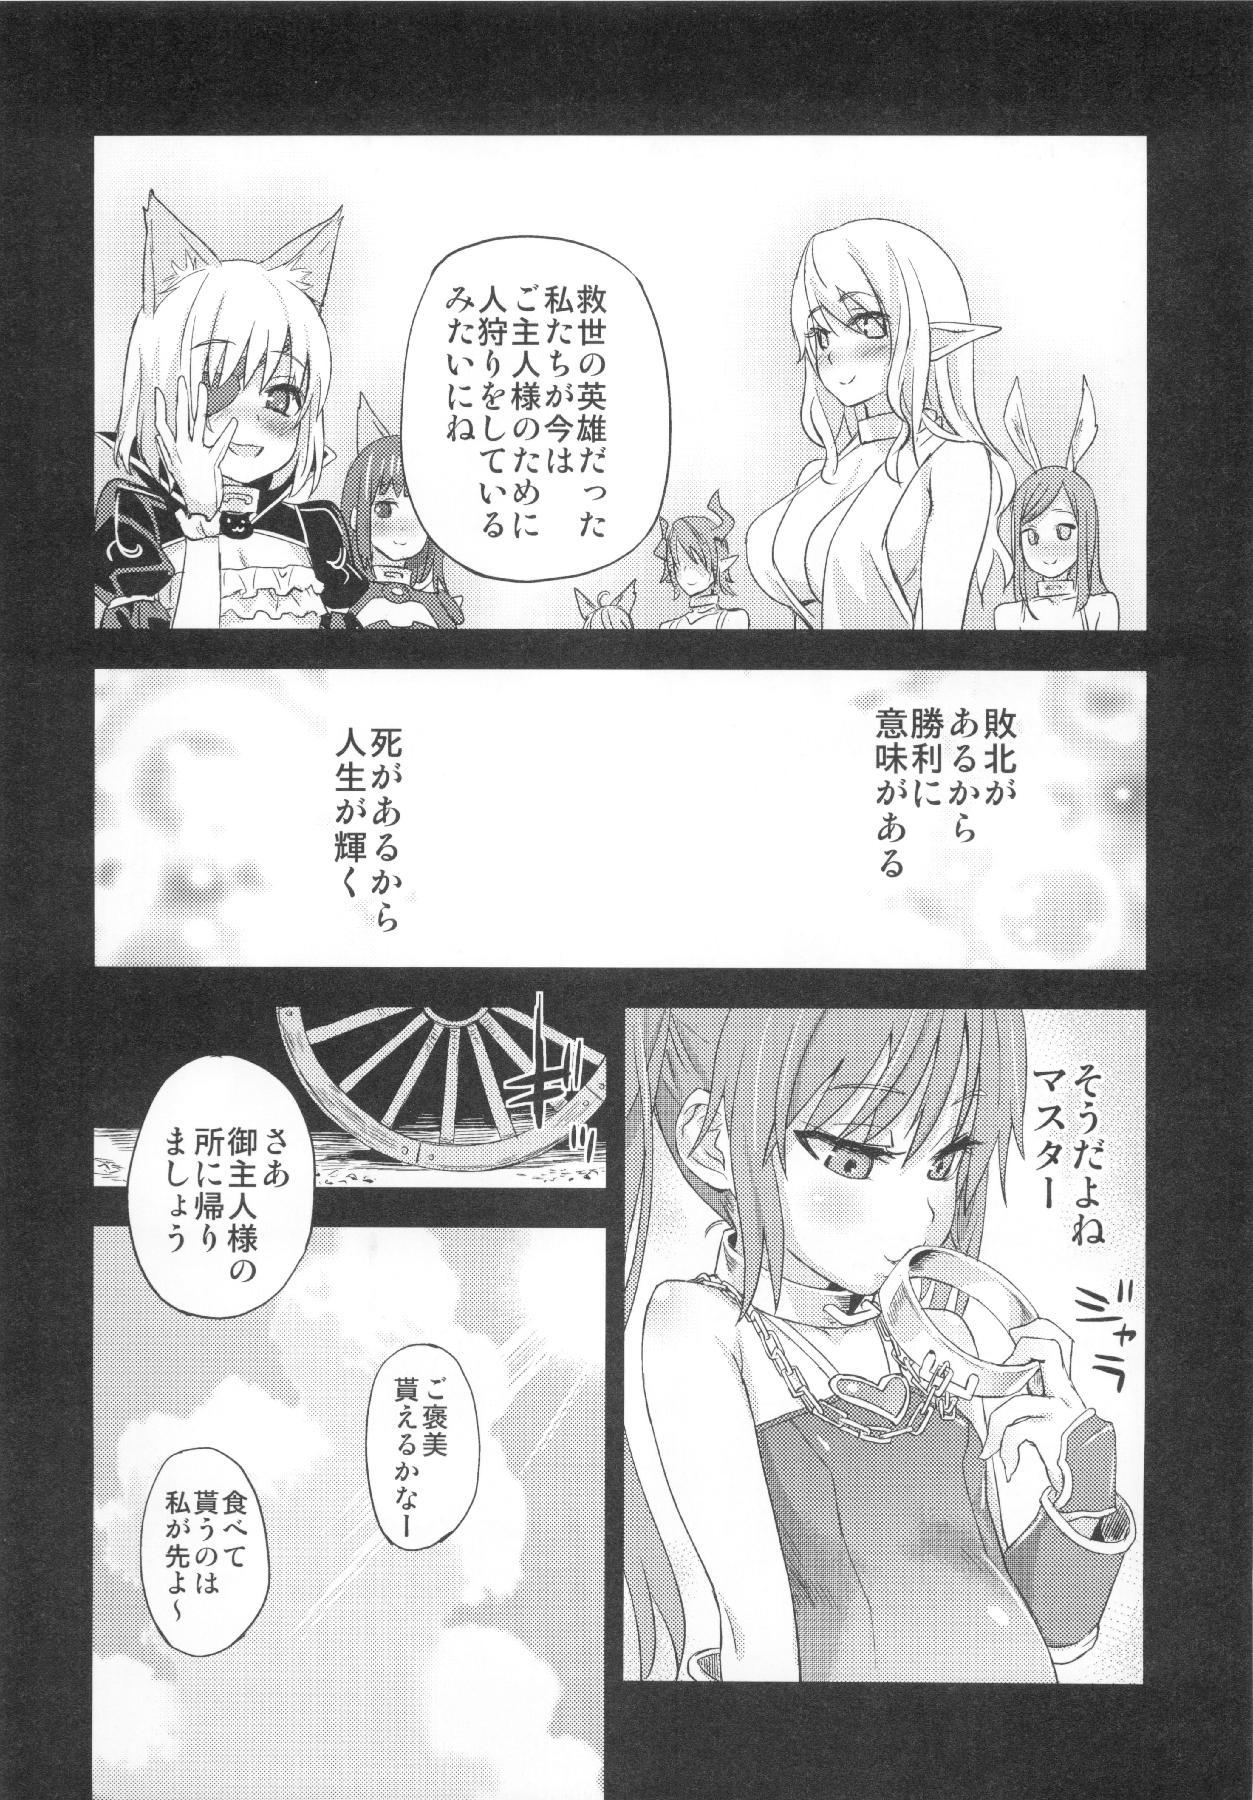 (C83) [Fatalpulse (Asanagi)] VictimGirls Compiled Vol.1 -Victimgirls Soushuuhen 1- MMO Game Selection (Various) 180